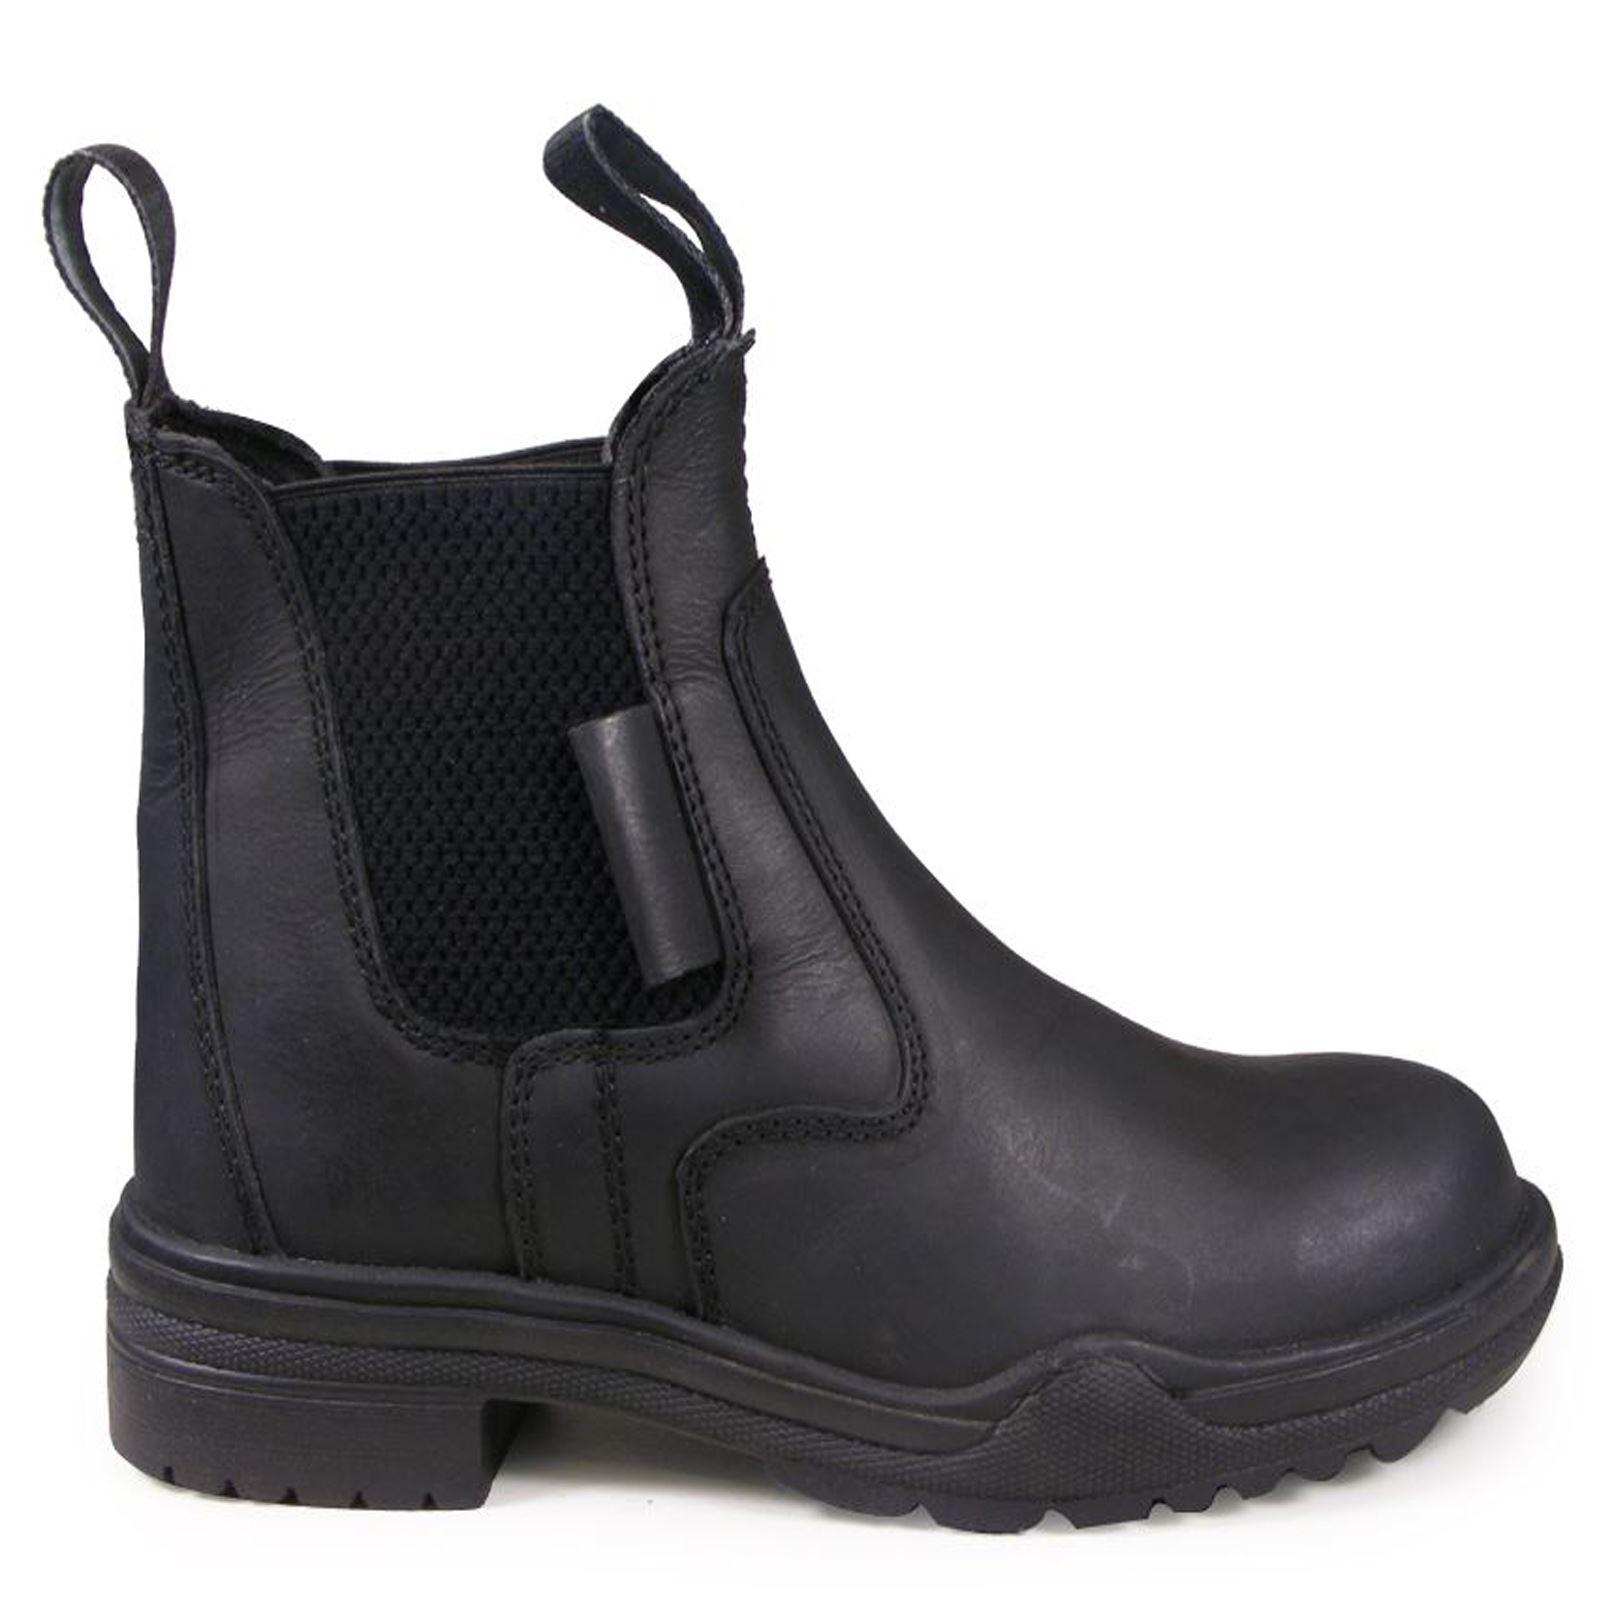 Adults Hard Rock Horse Riding Leather Steel Toe Short Working Yard Jodphur boots